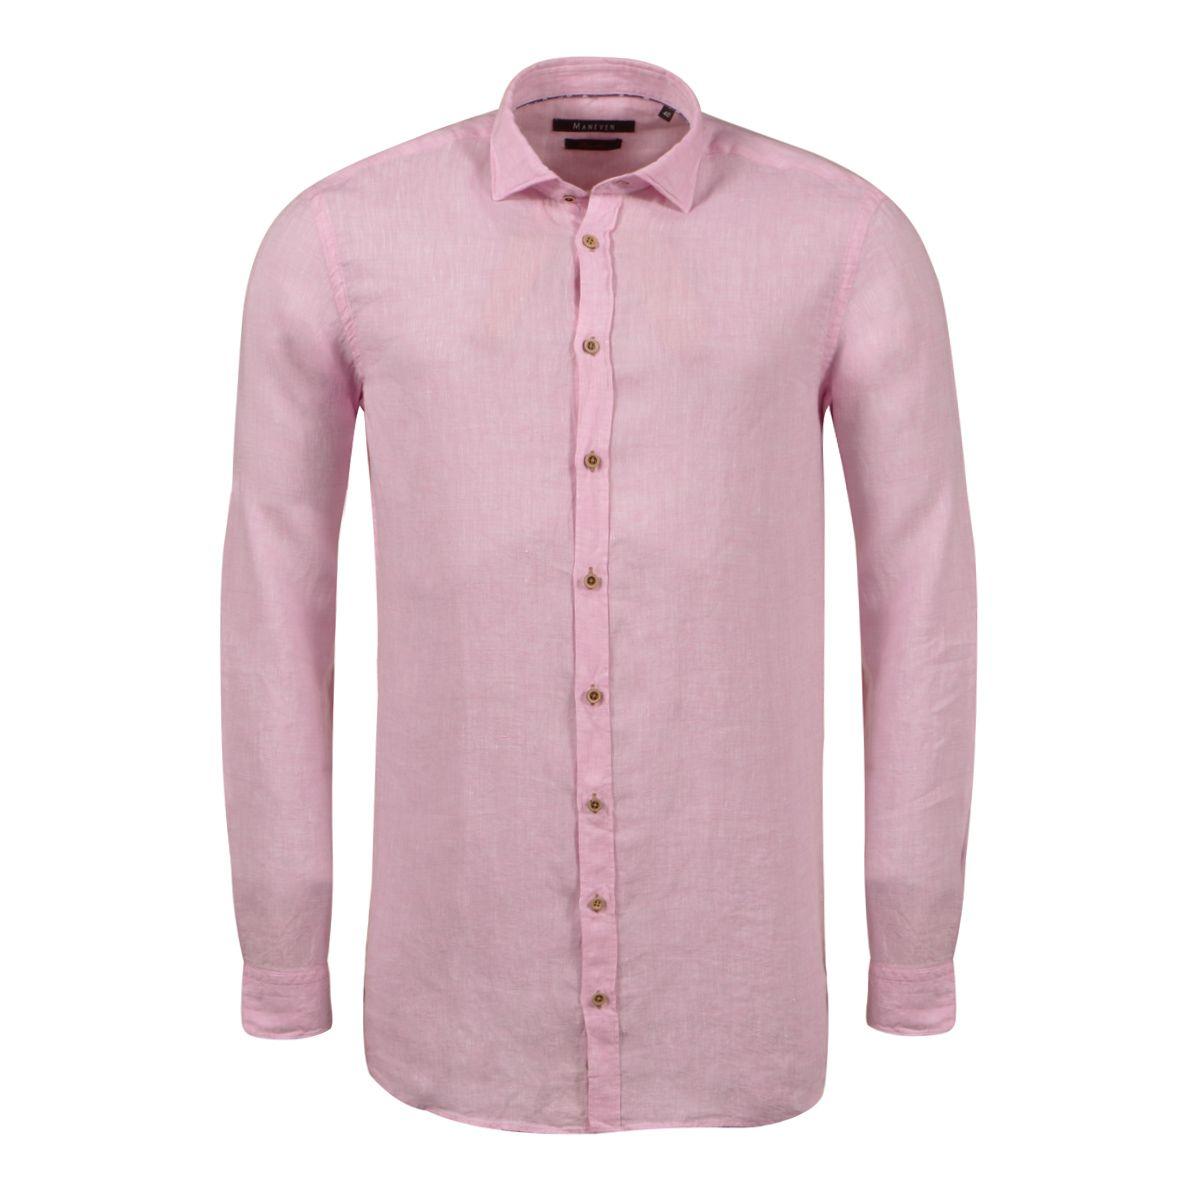 chemise en lin rose grande taille du 44 xl au 54 6xl size factory maneven. Black Bedroom Furniture Sets. Home Design Ideas